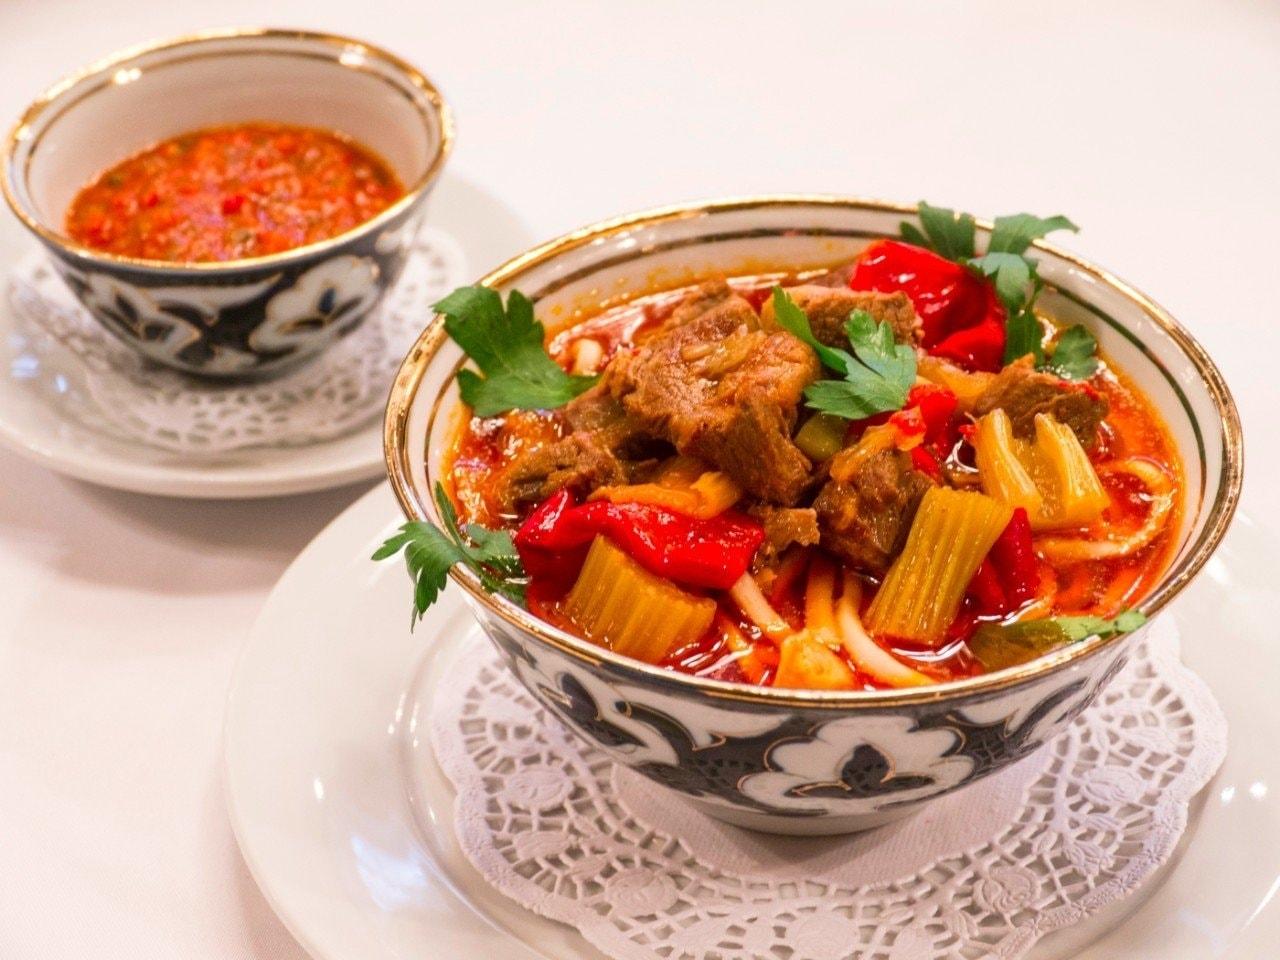 Узбекский лагман рецепт с фото в домашних условиях